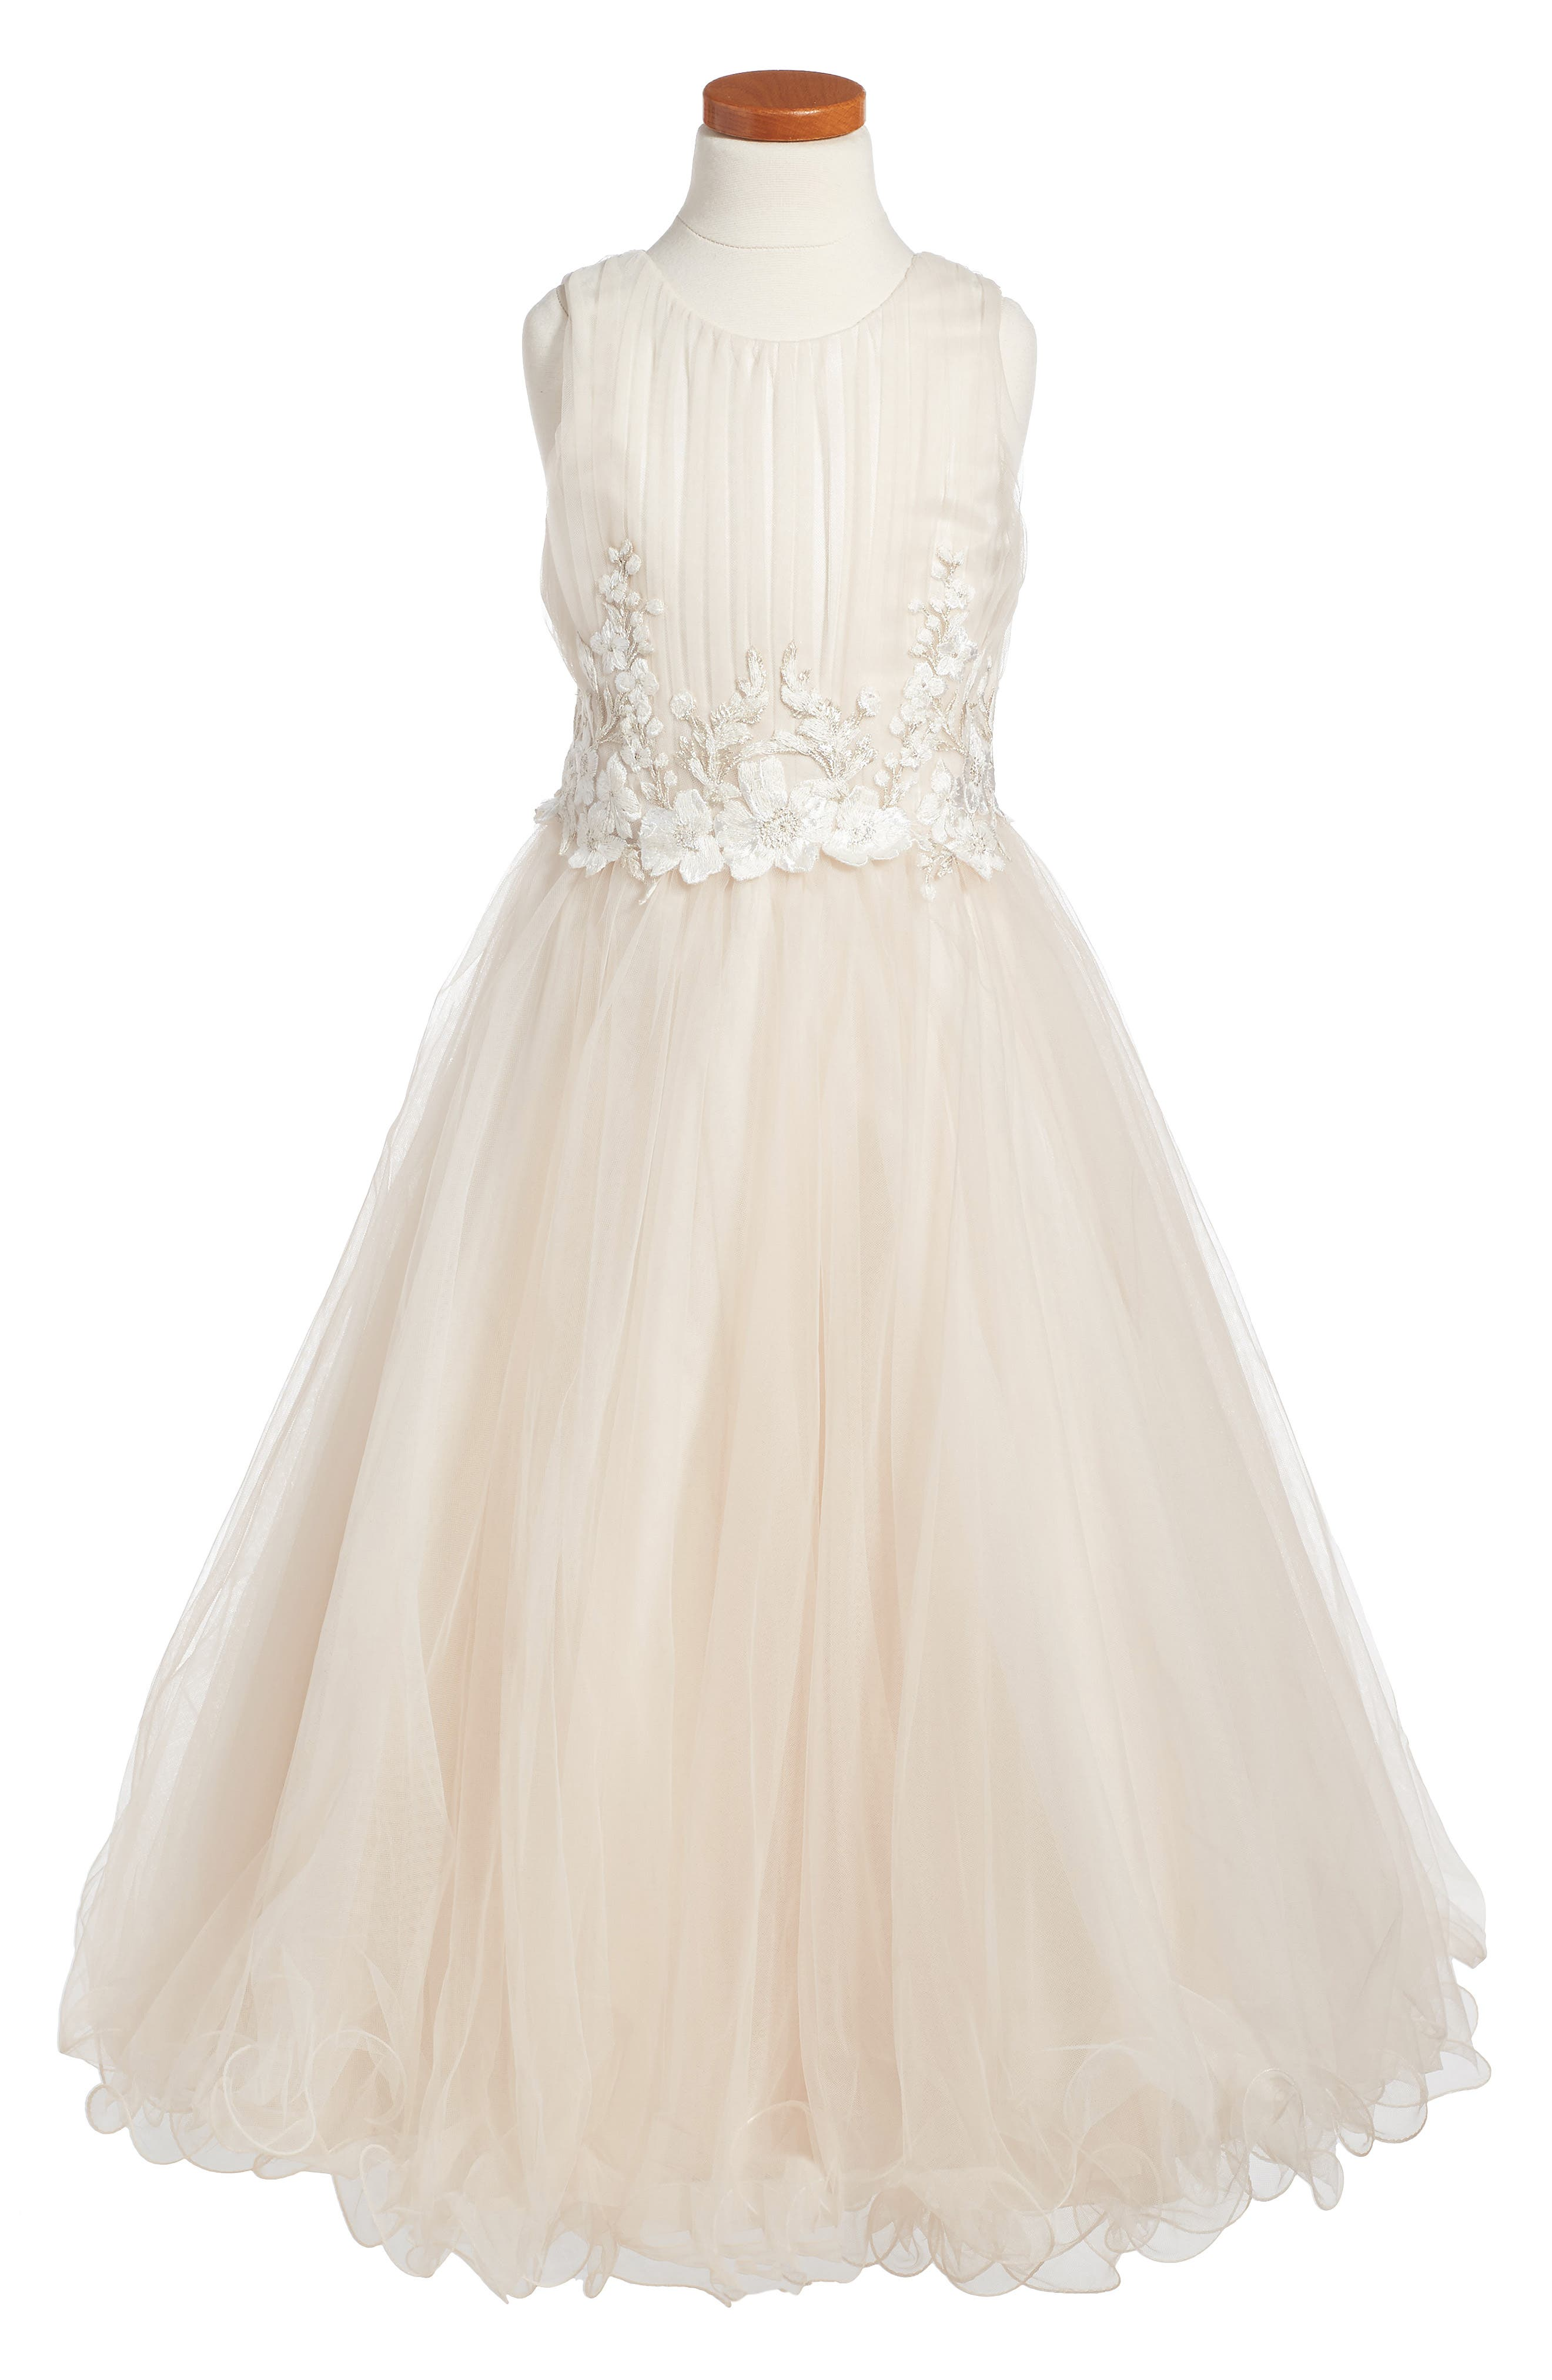 Lace & Tulle Dress,                             Main thumbnail 1, color,